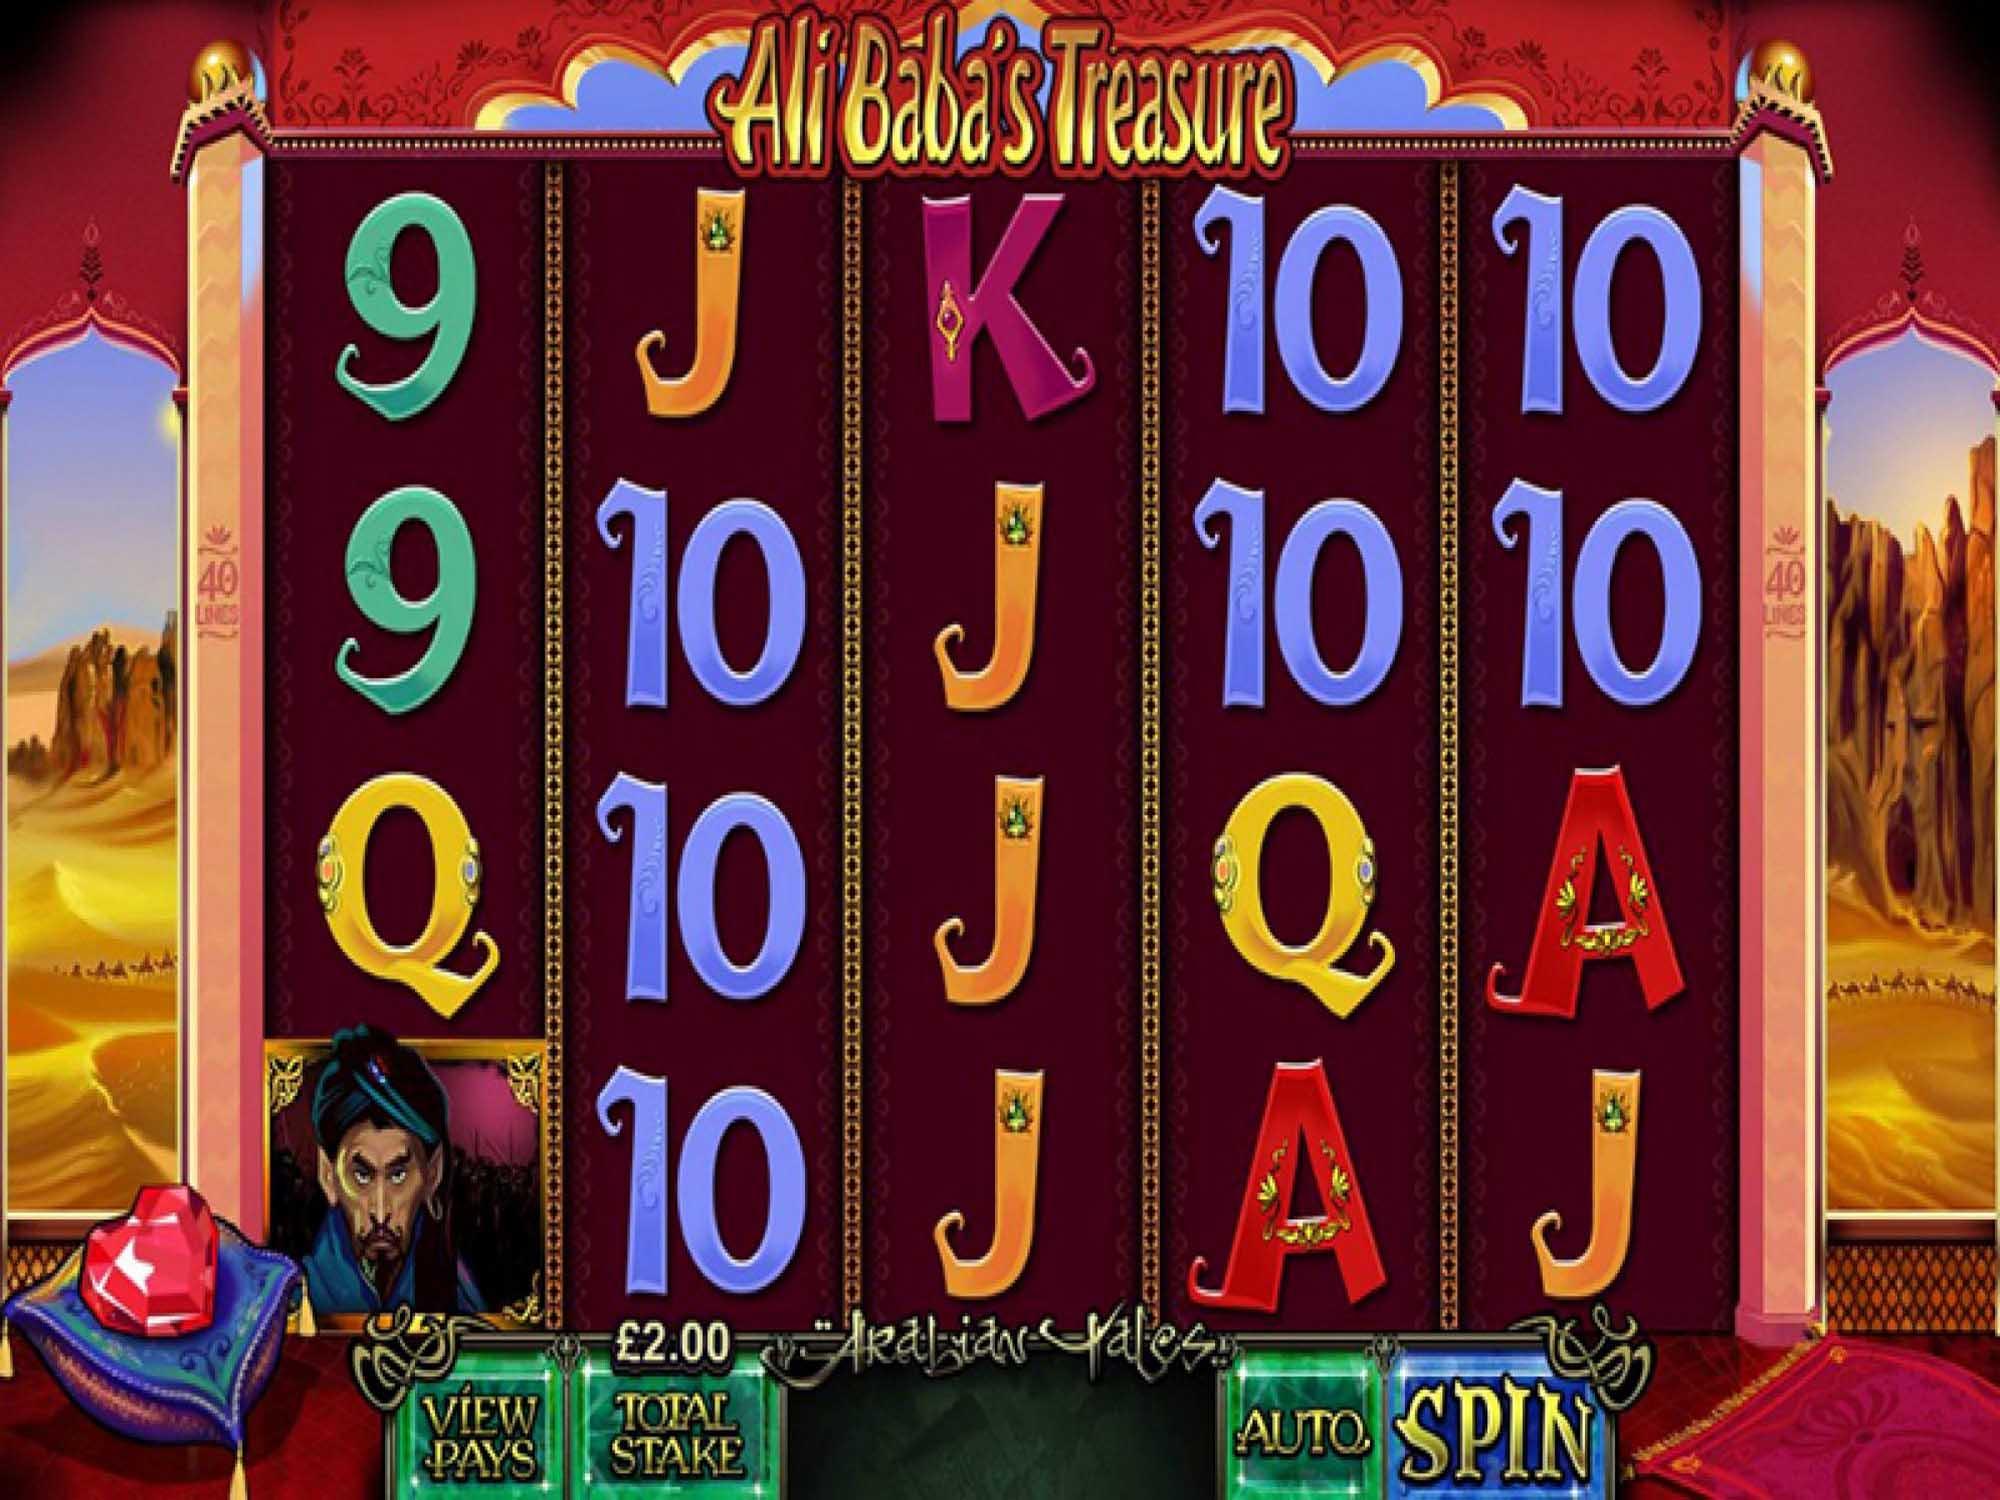 Ali Baba's Treasure Slot Review